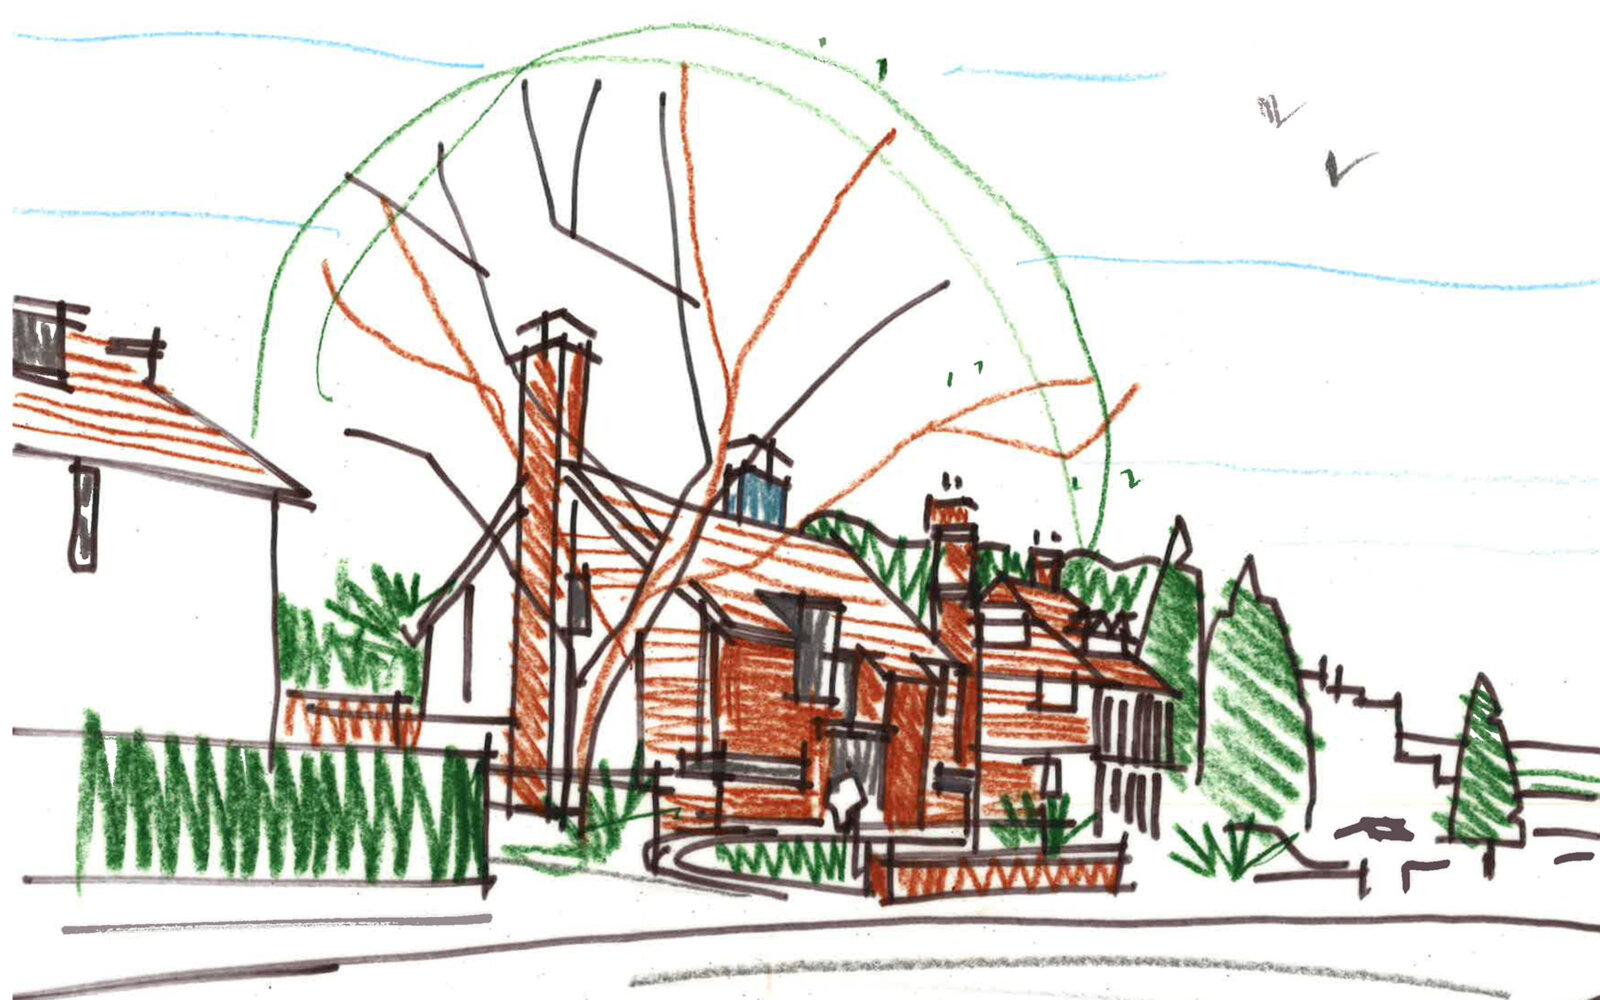 House concept sketch